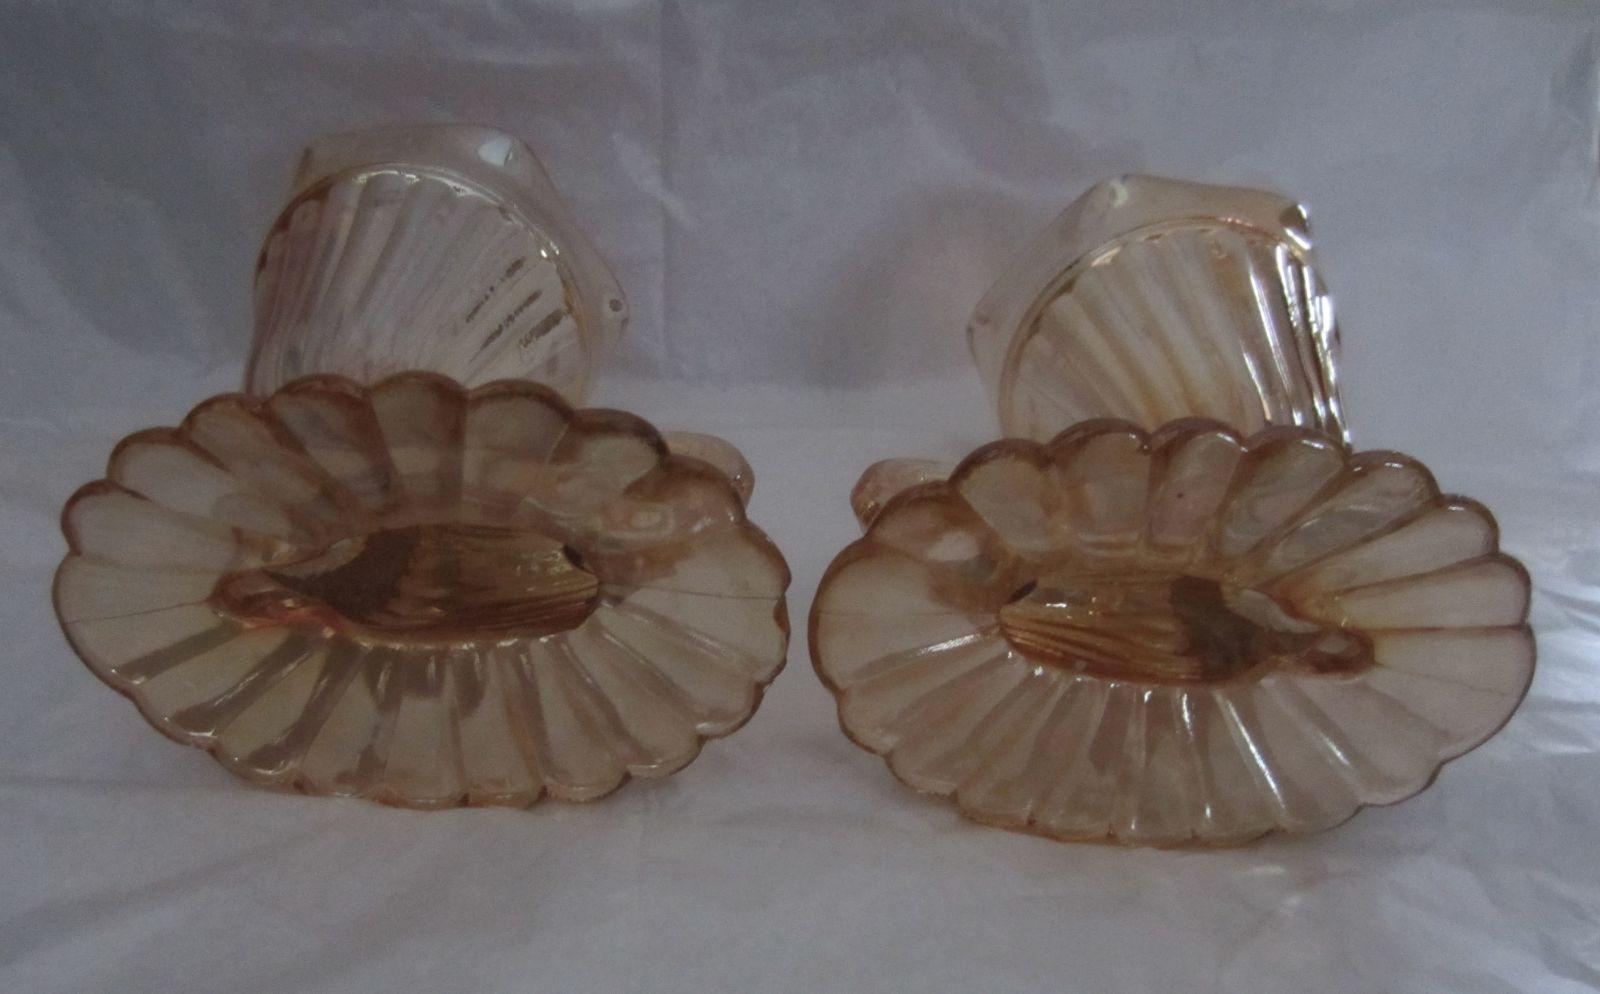 2X Jeanette Carnival Glass Horn Of Plenty Cornucopia Marigold Footed Vases